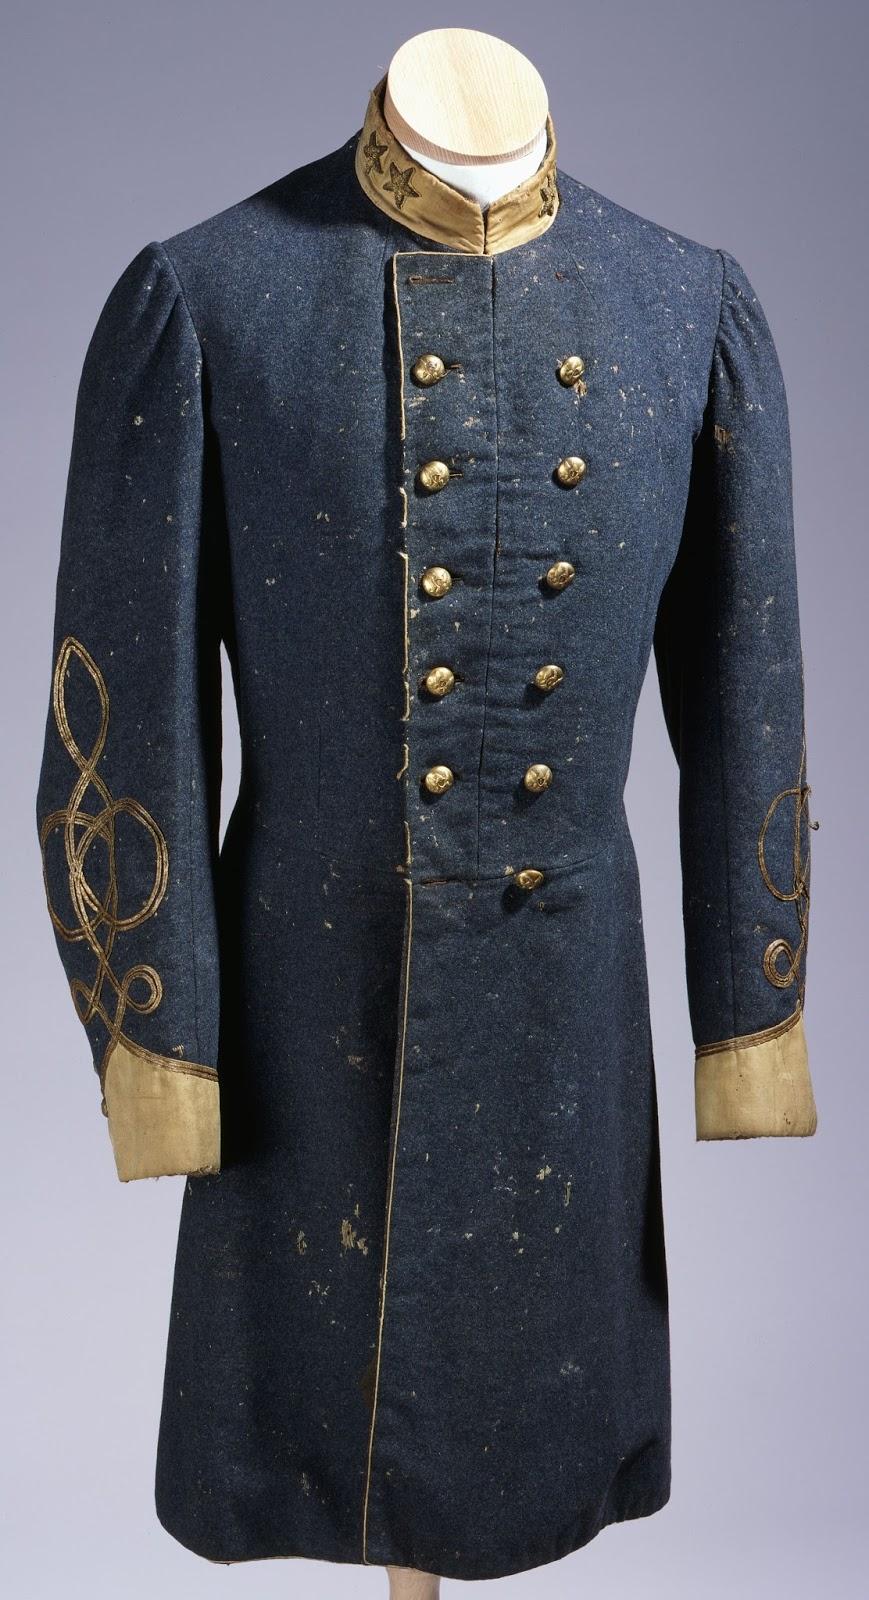 North Carolina Civil War Uniforms Civil War Uniforms During